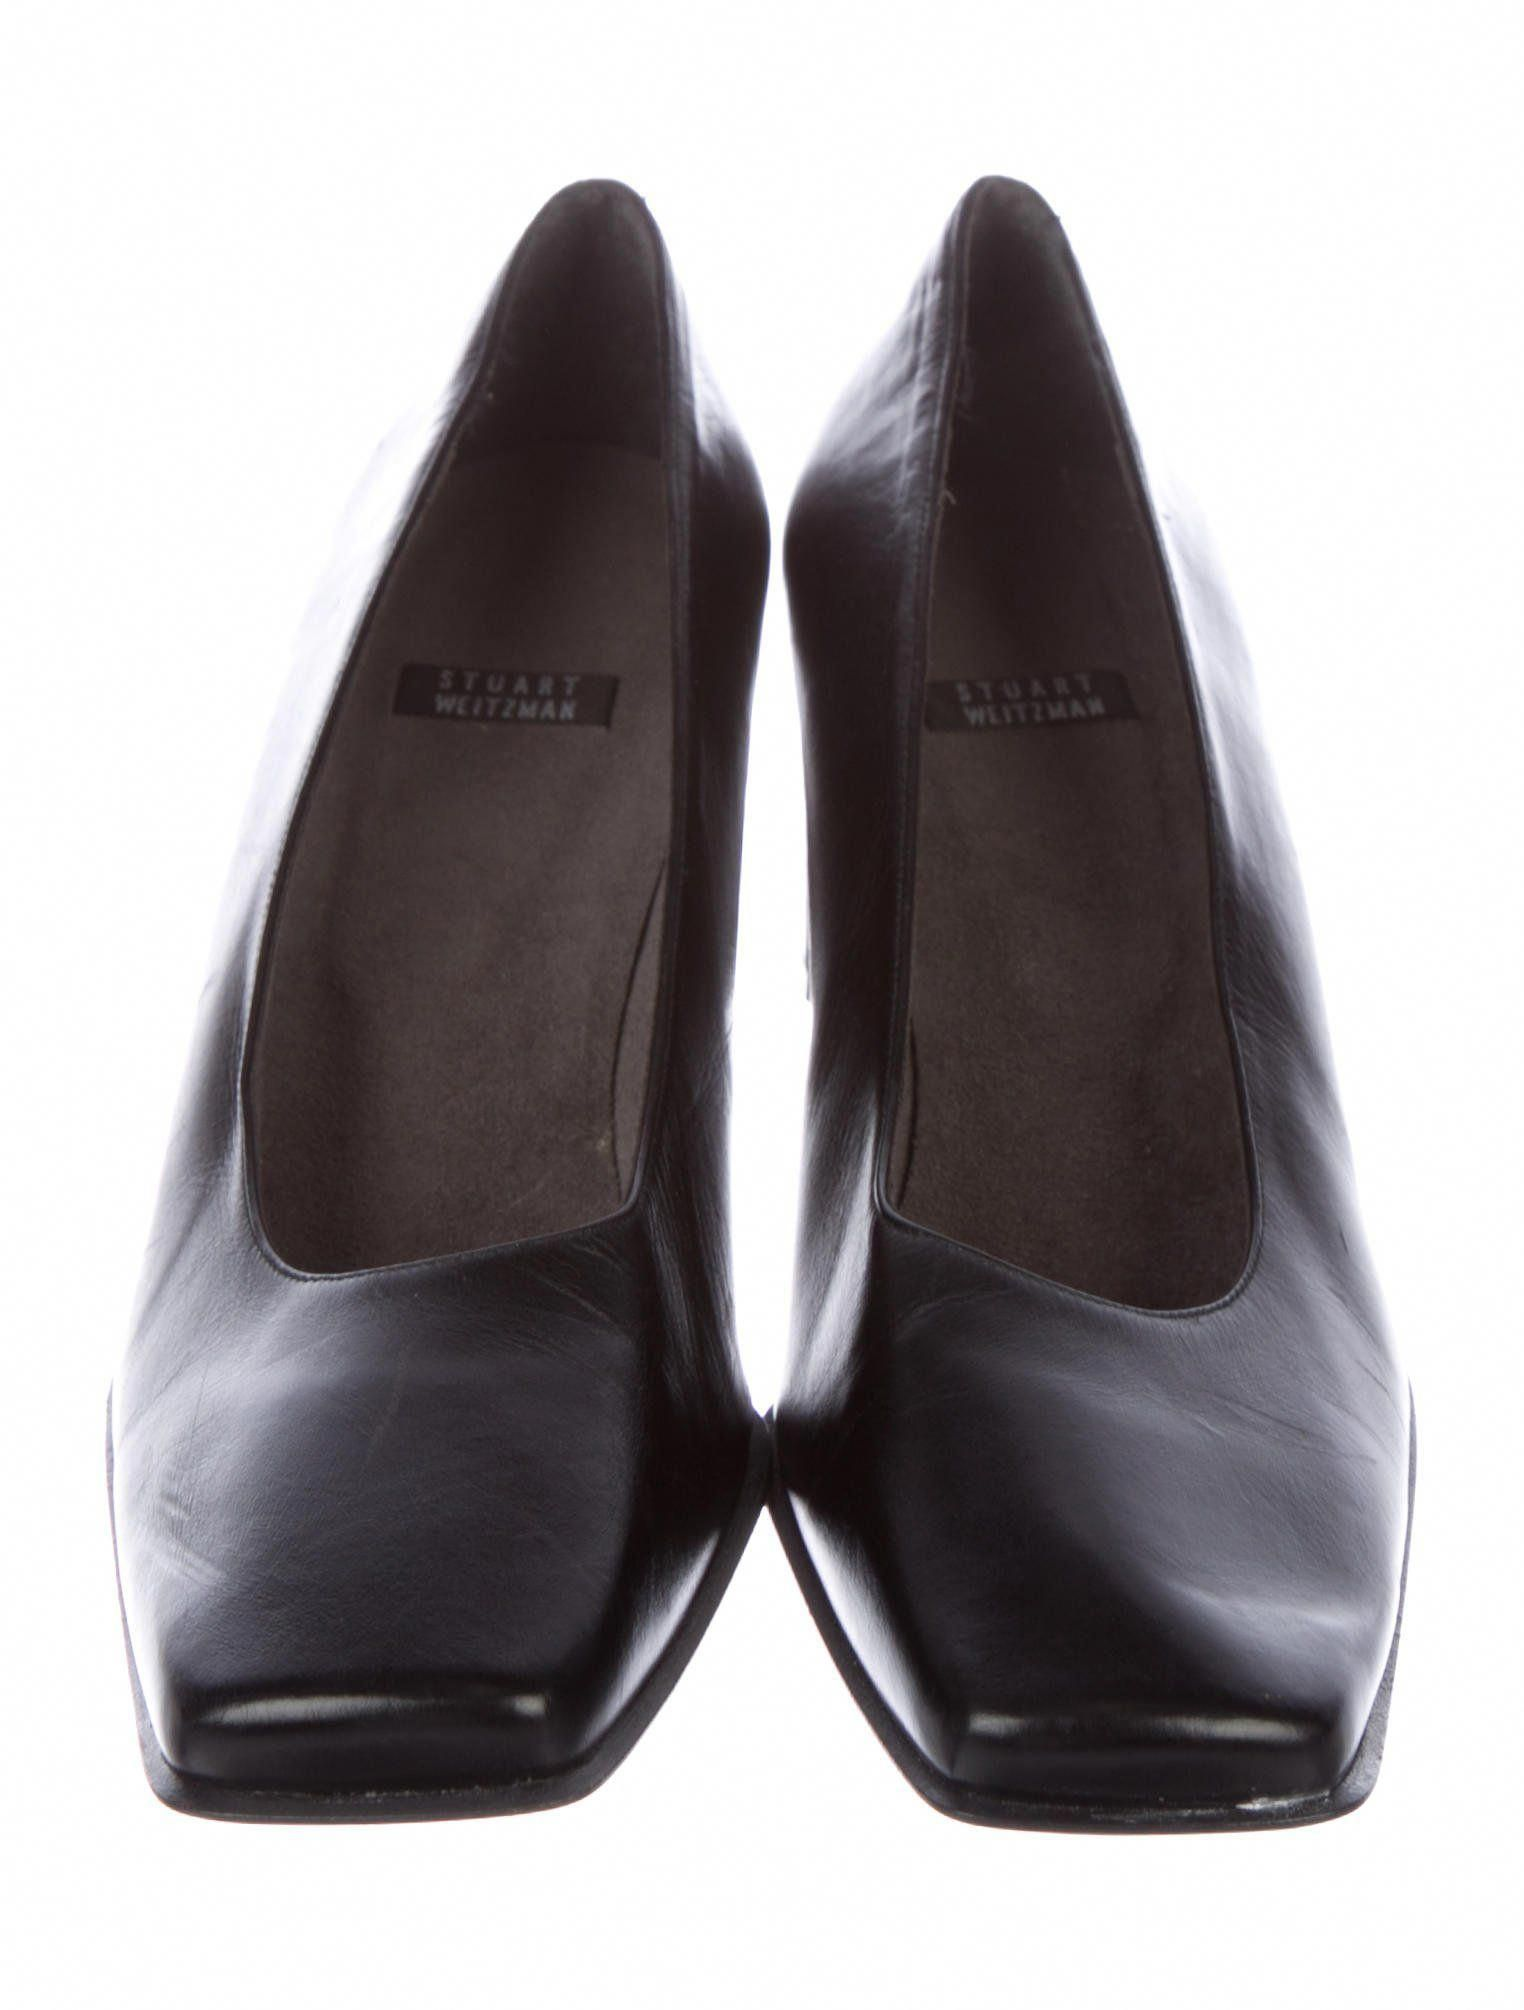 70bde033094 Black leather Stuart Weitzman square-toe pumps with covered block heels.   StuartWeitzman